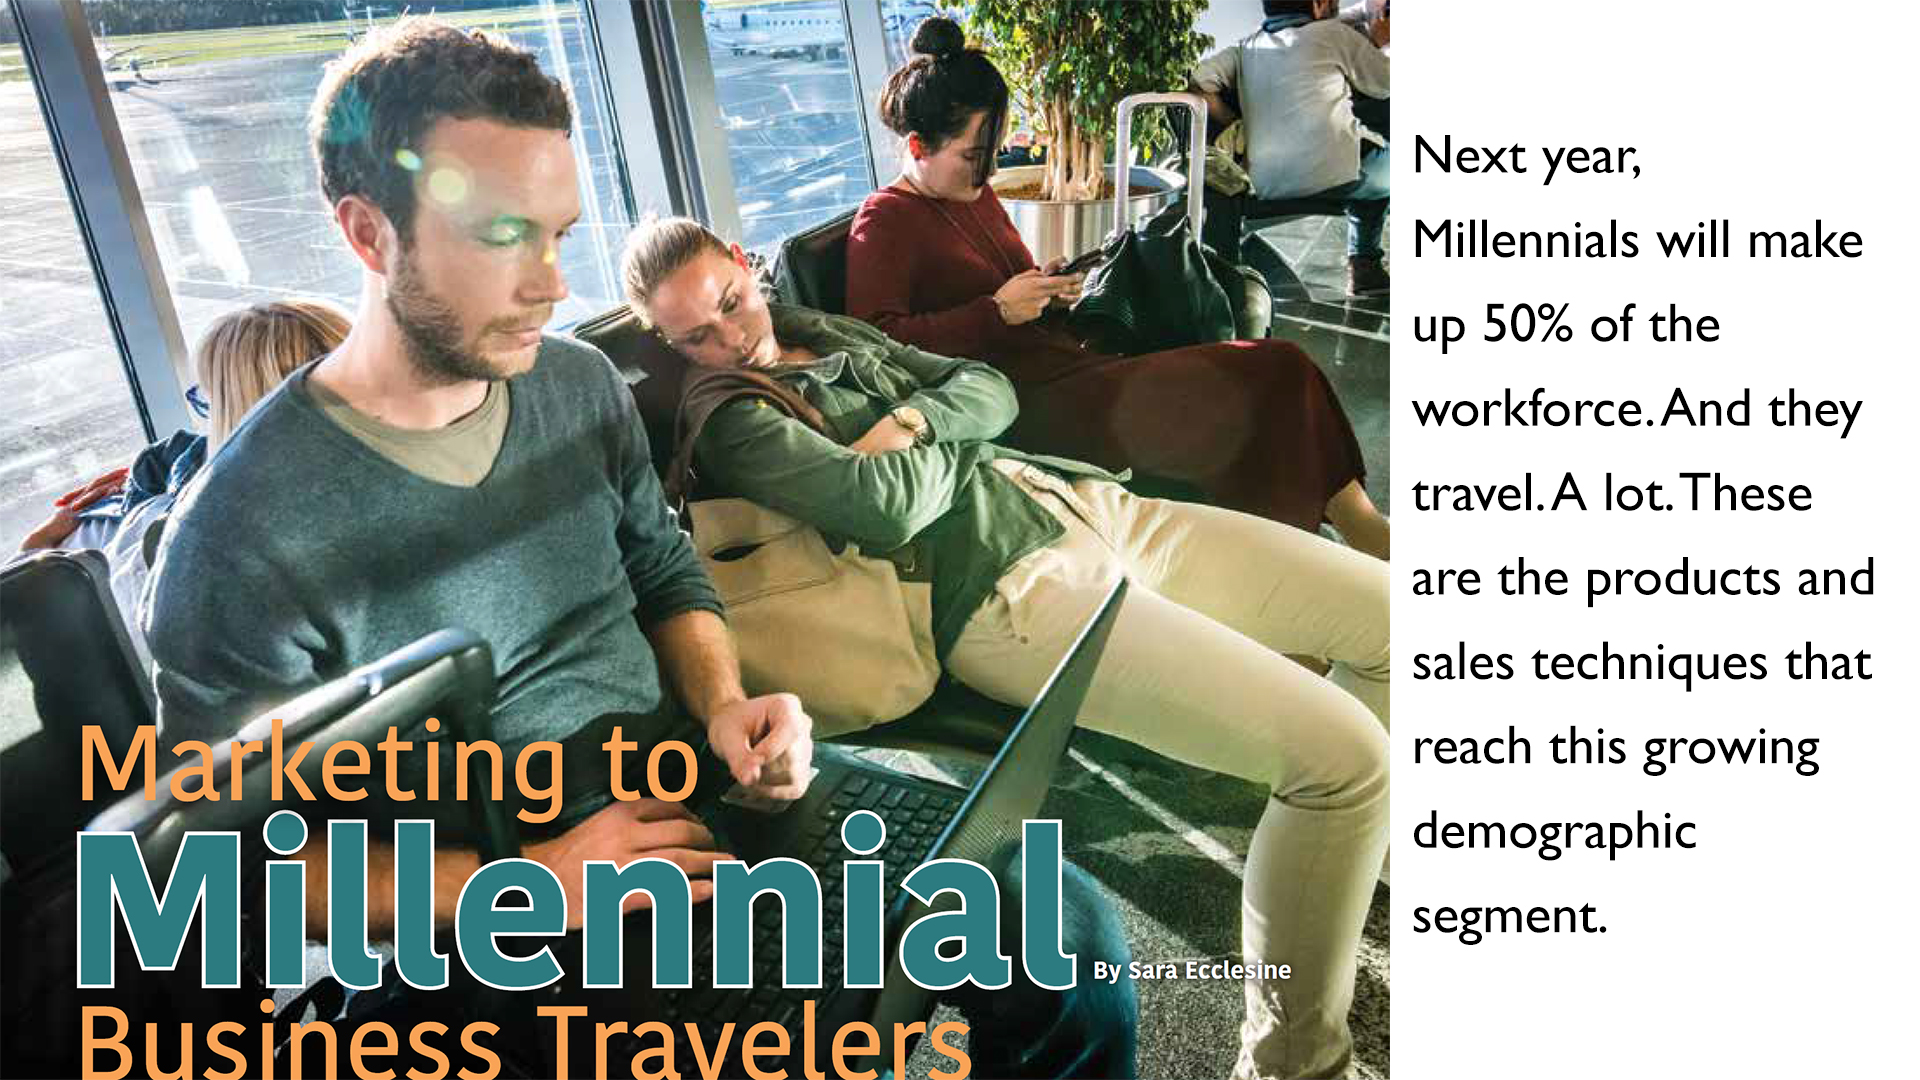 Millennials will make up 50% of the workforce in 2020